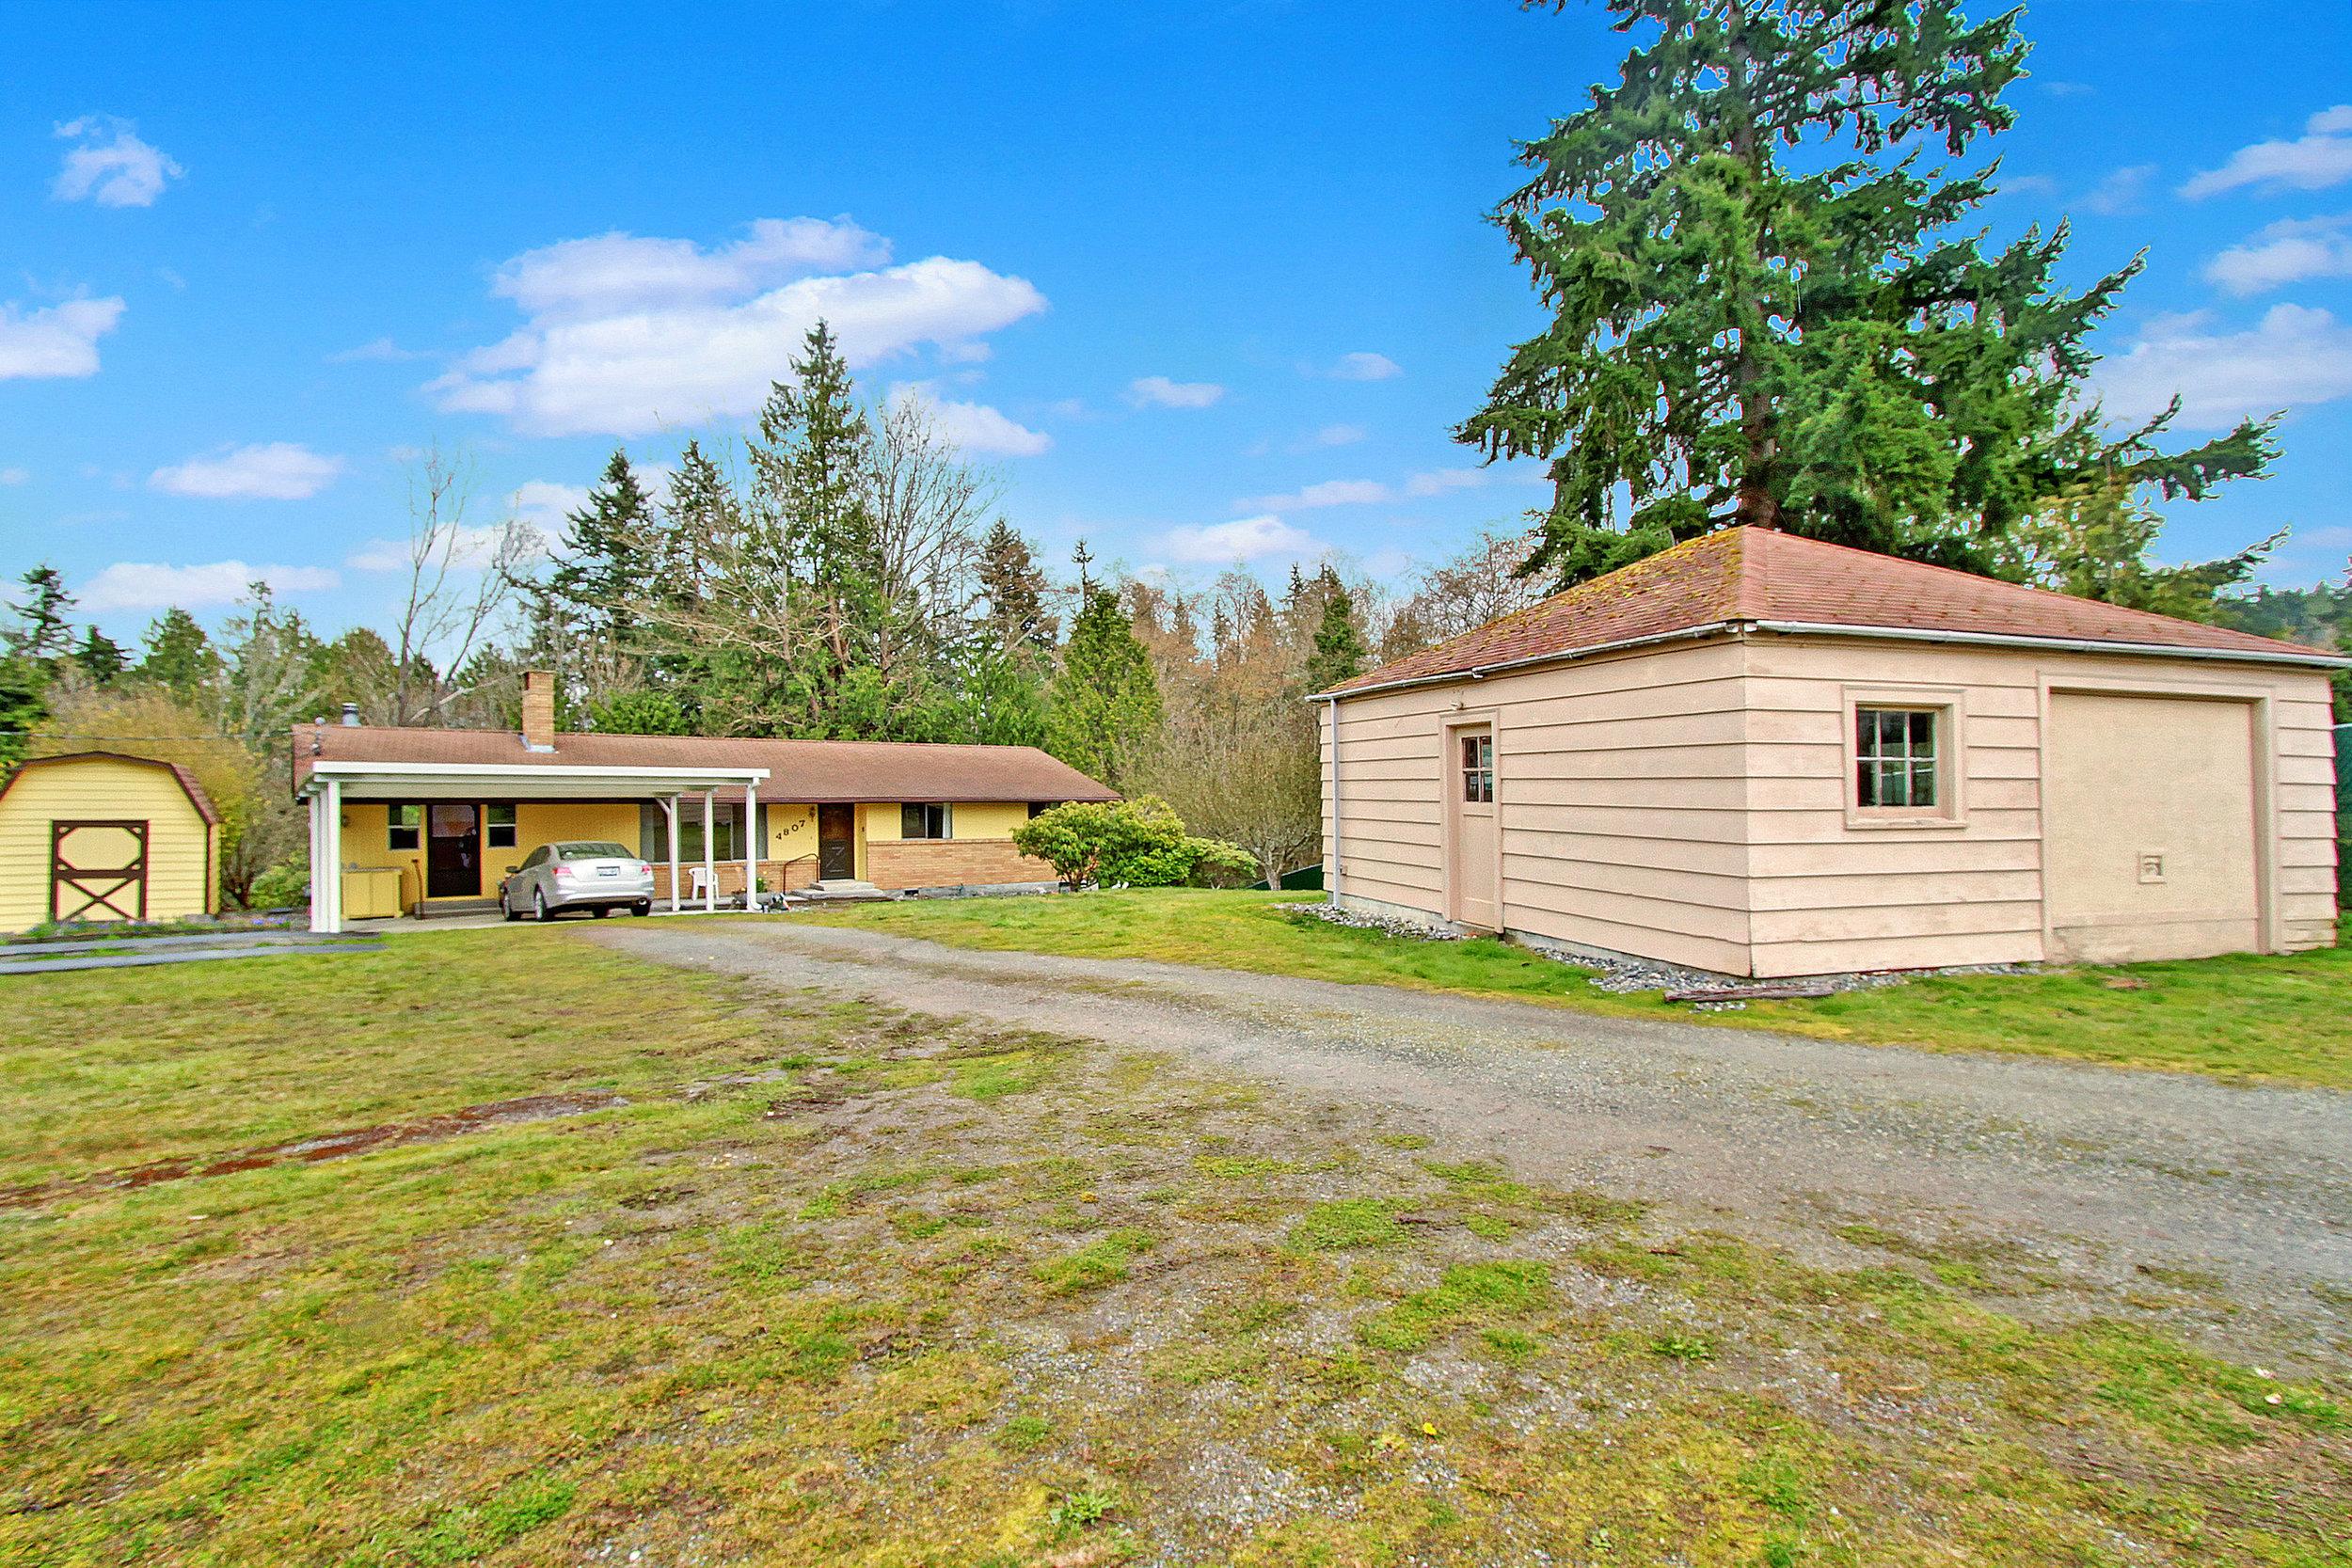 Classic Rambler +Building Lot - 4805-4807 Bayview Ln, Everett WA 98203